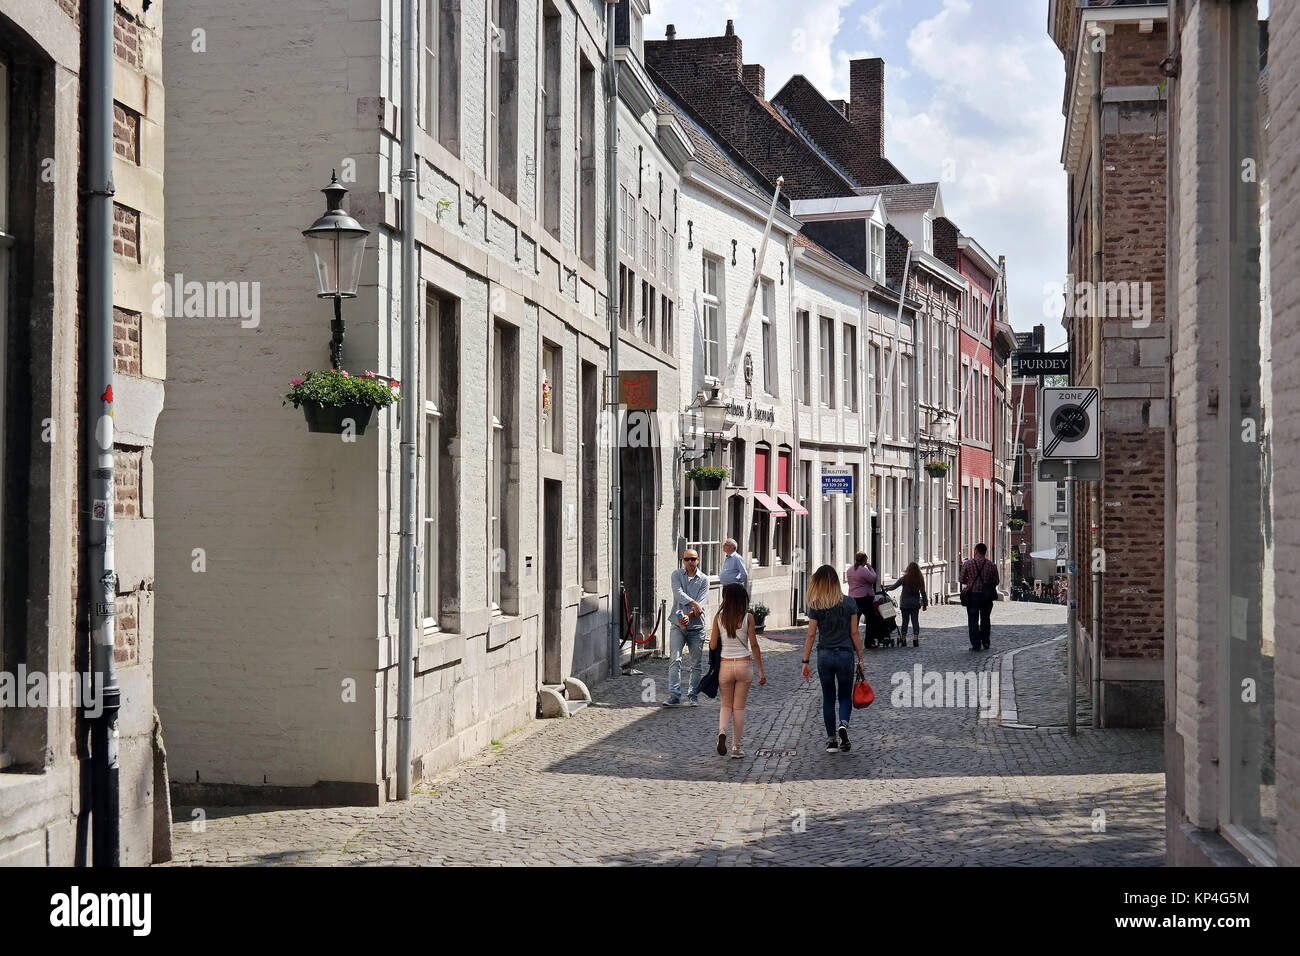 Shopping Street In Maastricht Netherlands Stock Photos Shopping